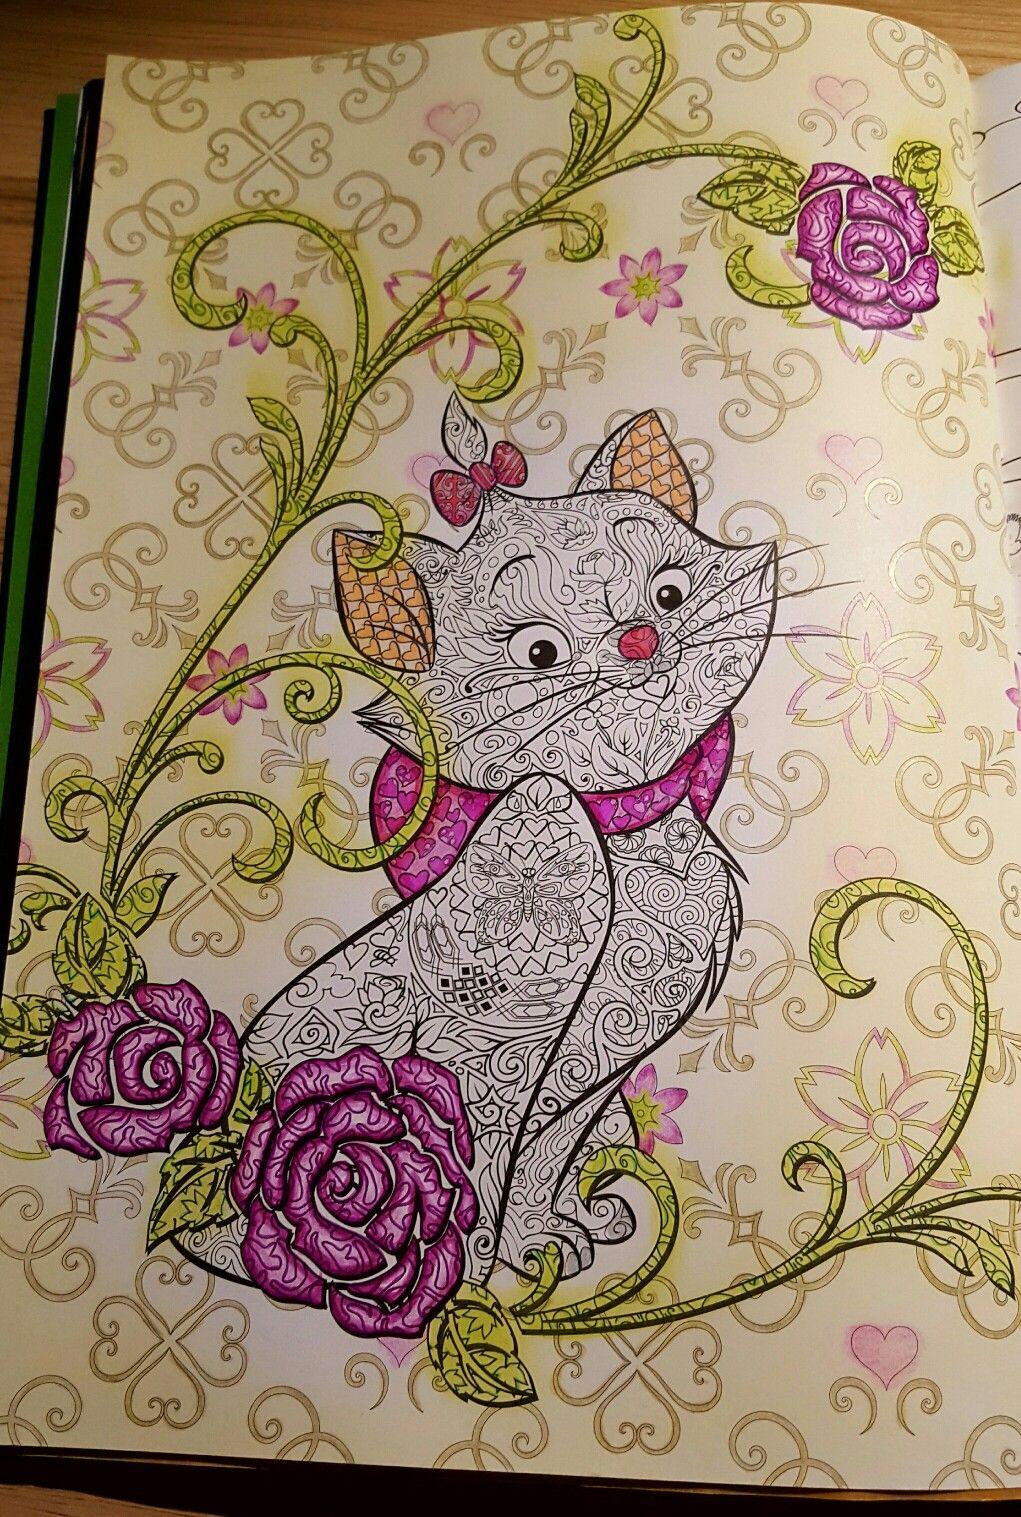 Marie - Le bestiaire extraordinaire - Disney  #arttherapie  #disney